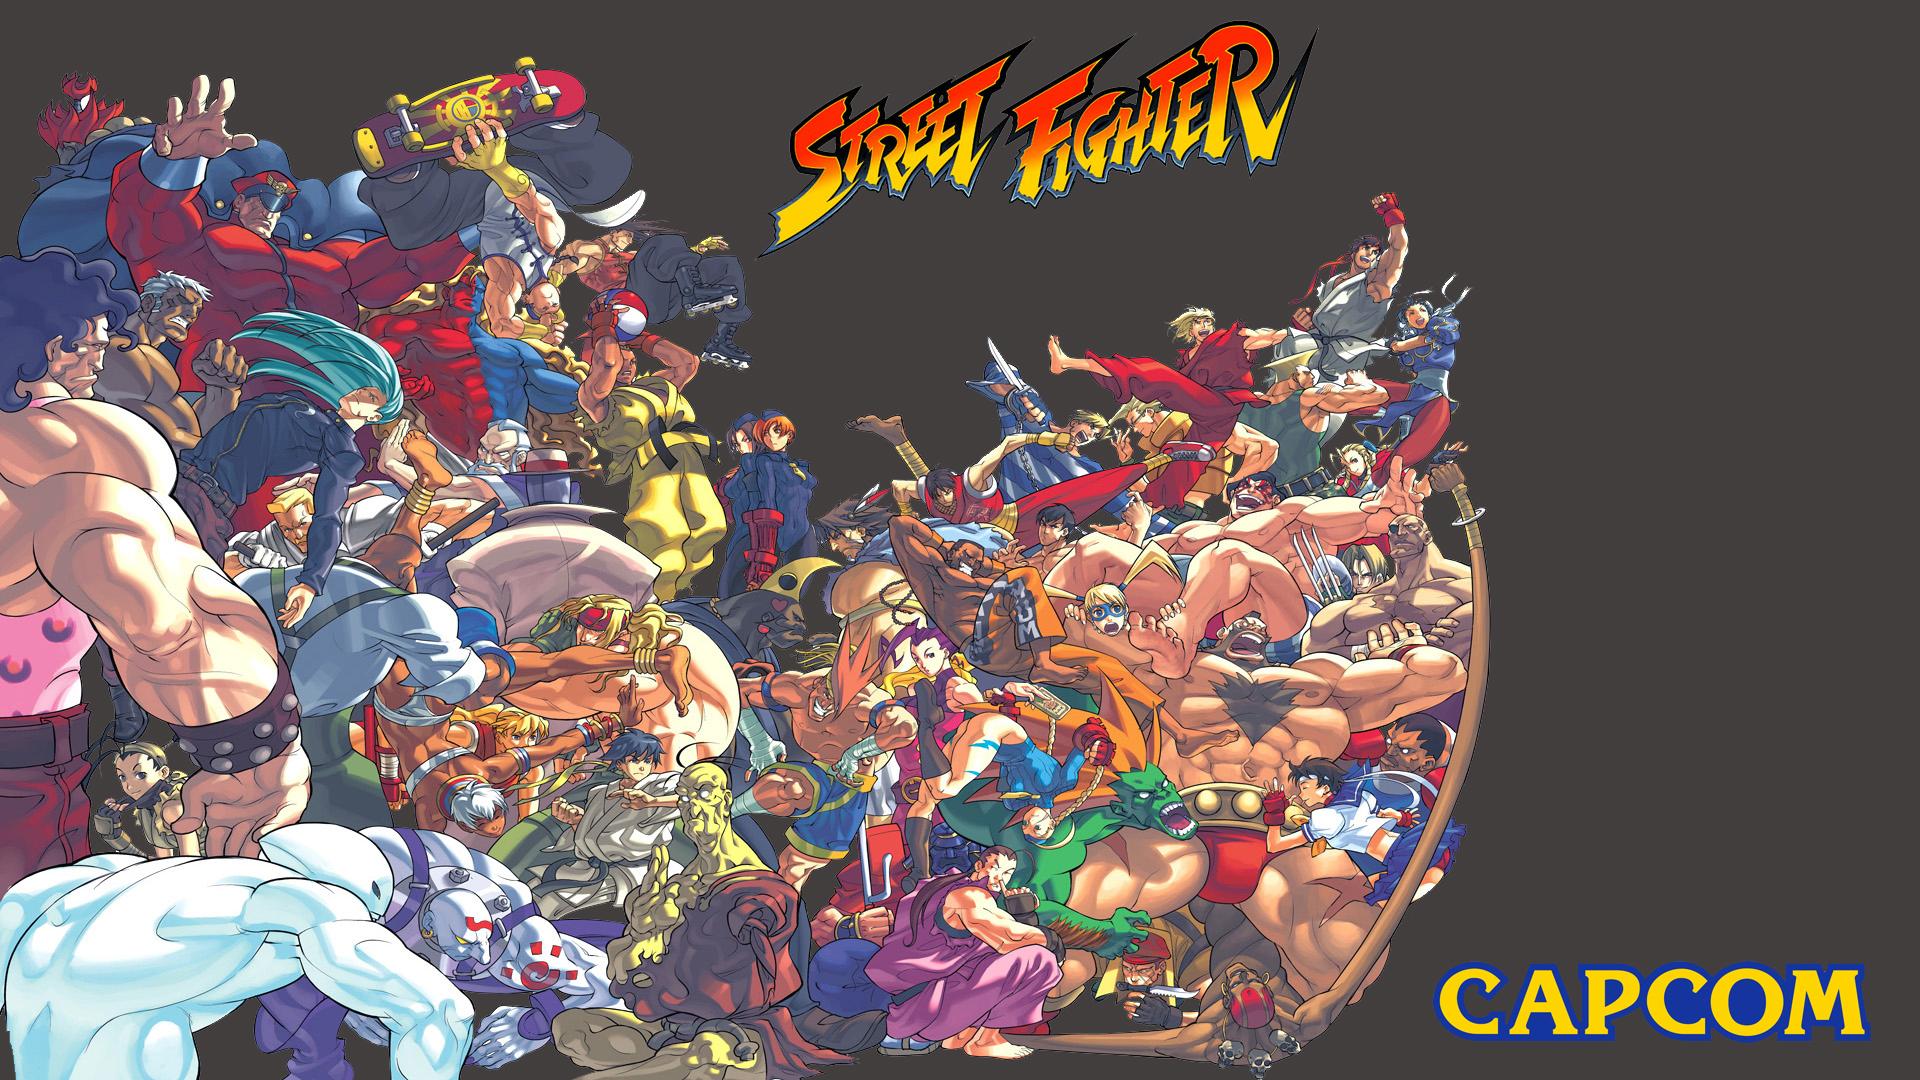 Street Fighter 5 Wallpaper: Street Fighter 5 HD Wallpaper